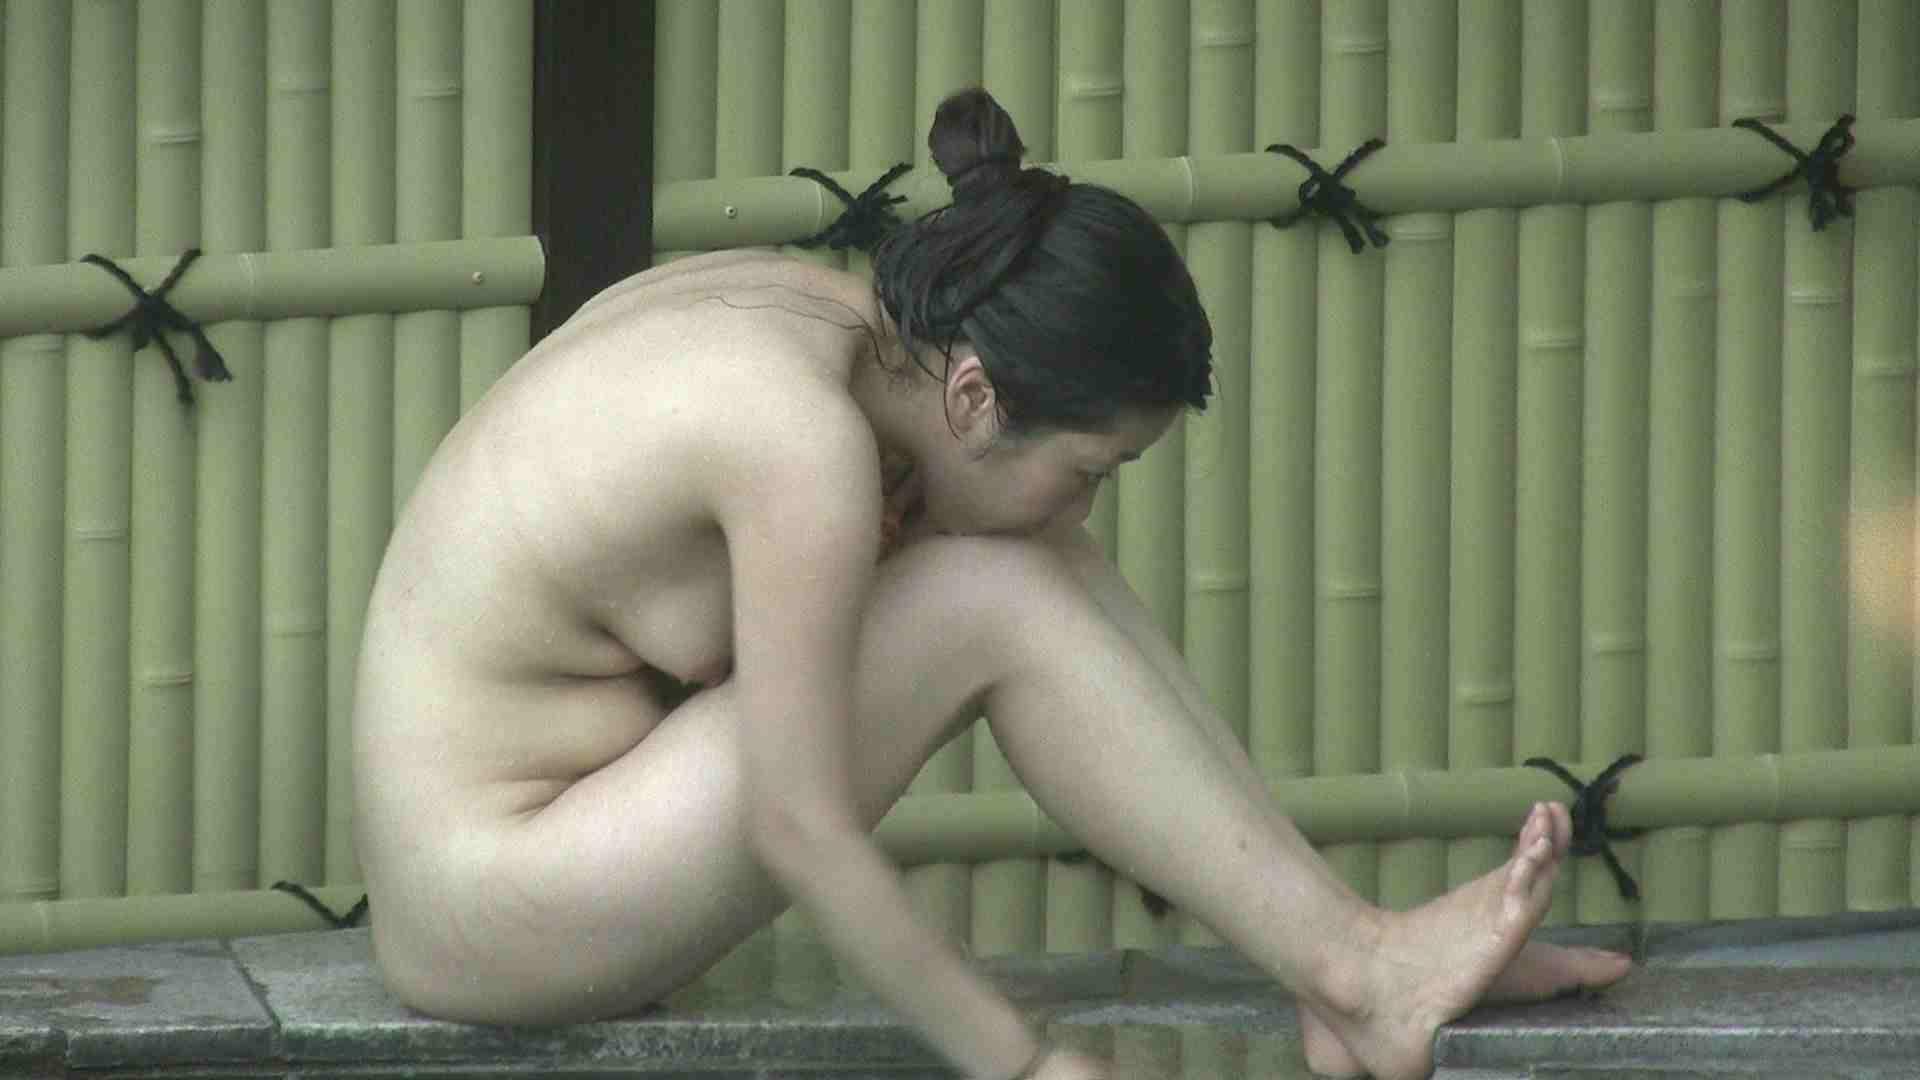 Aquaな露天風呂Vol.194 露天風呂 性交動画流出 112連発 101